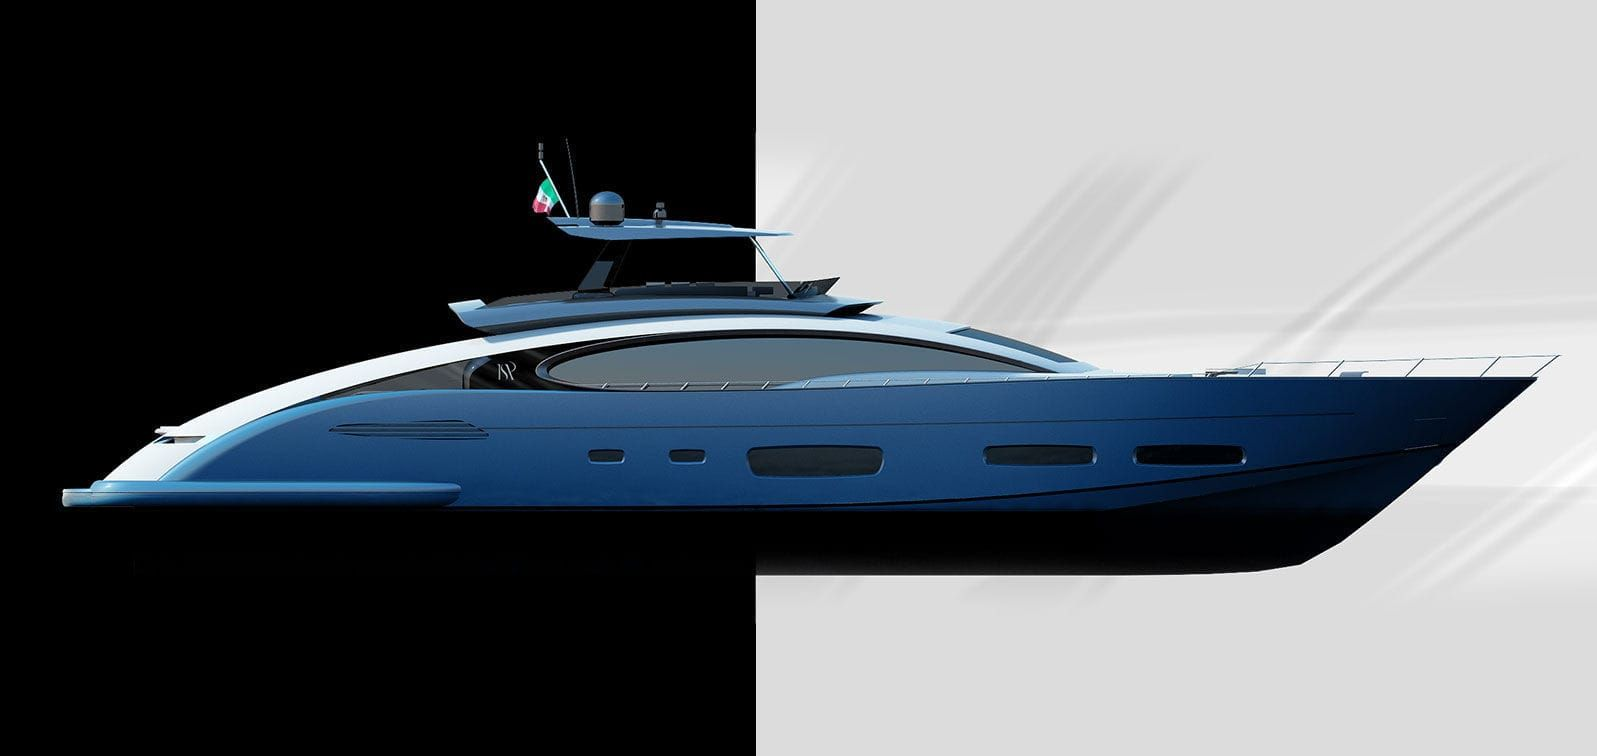 Yacht design sketches | Yacht \u0026 Boat | Pinterest